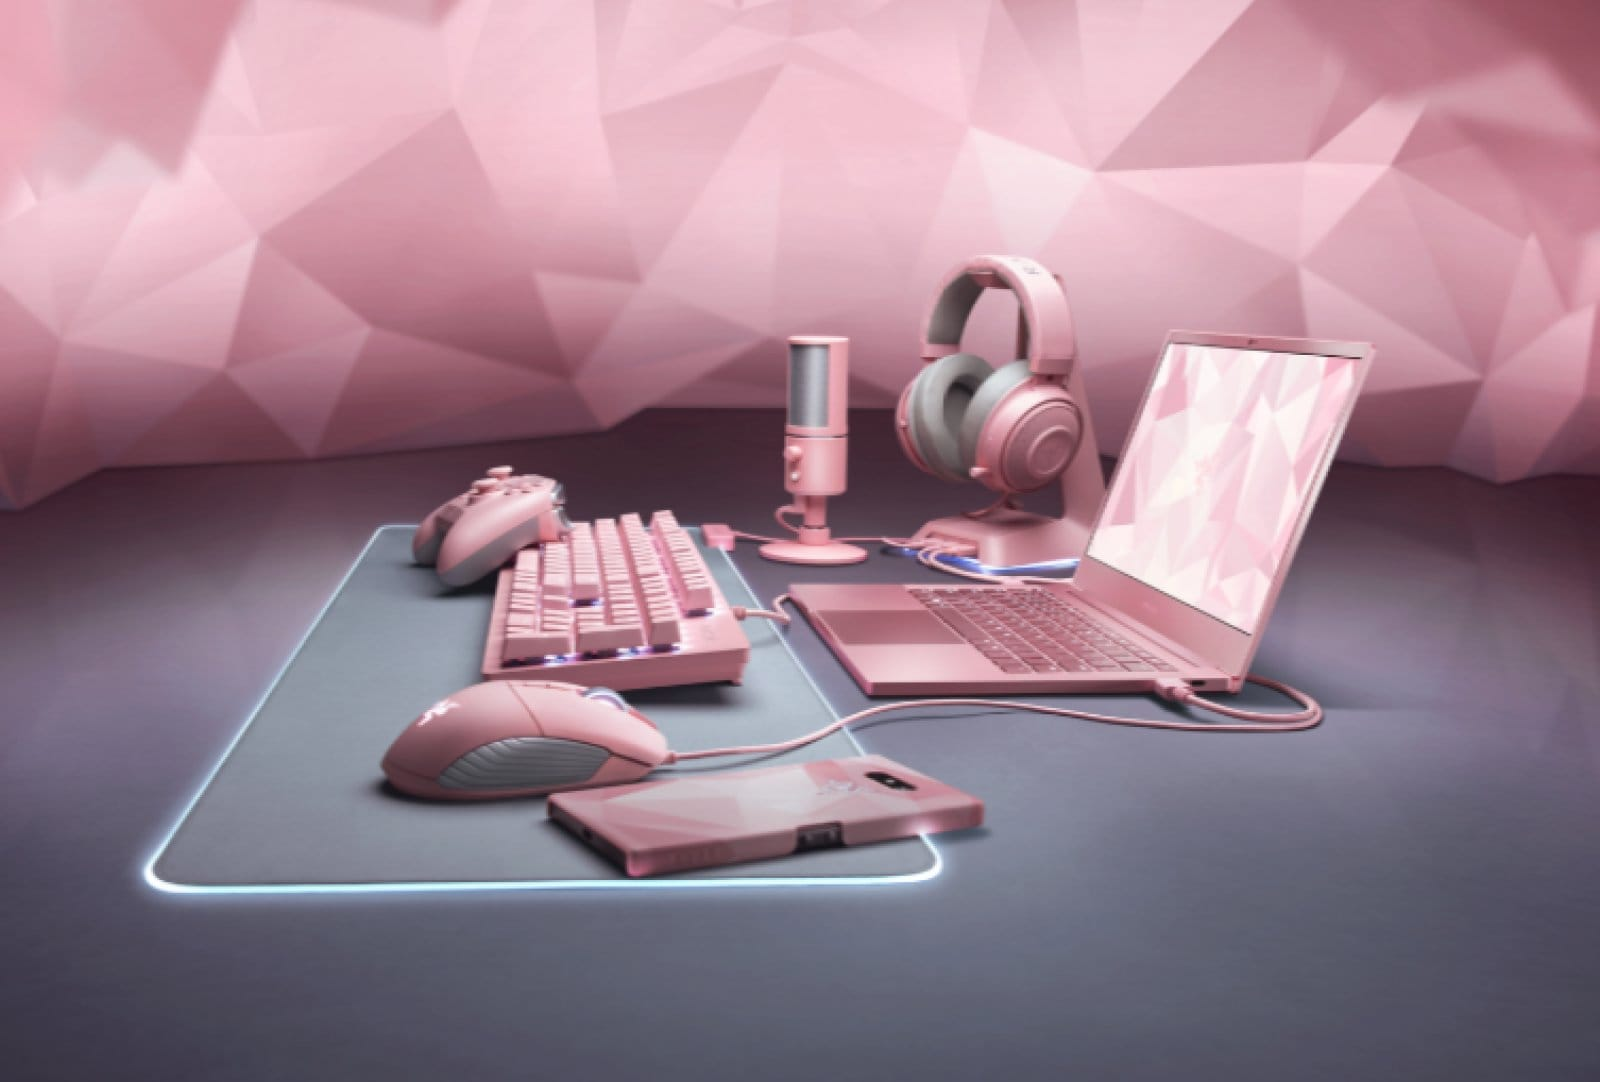 Razer Quartz Pink edition